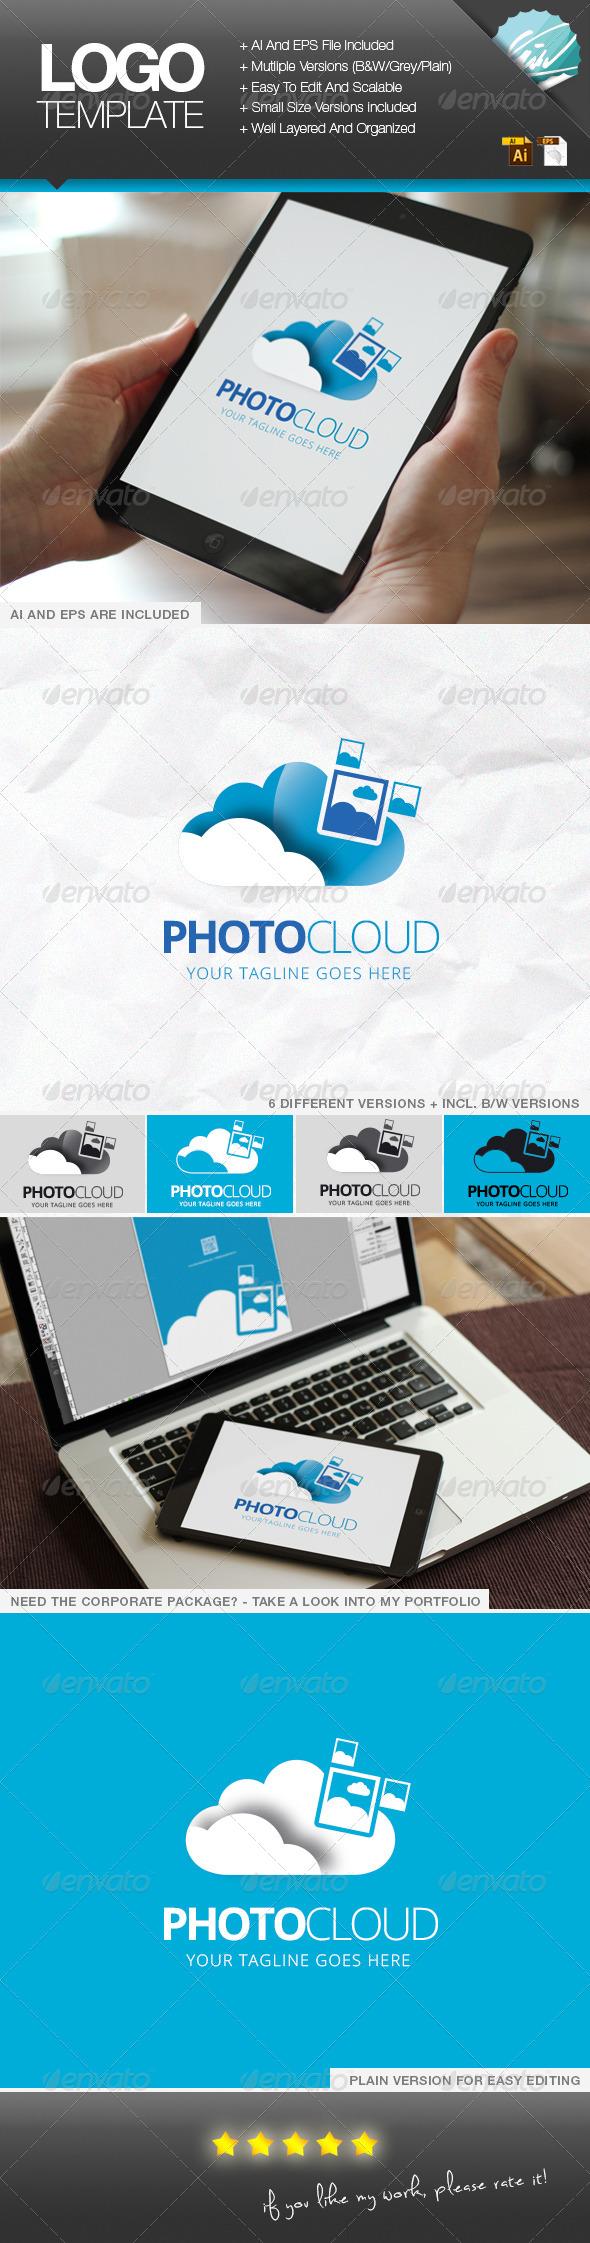 GraphicRiver Photo Cloud 6840460